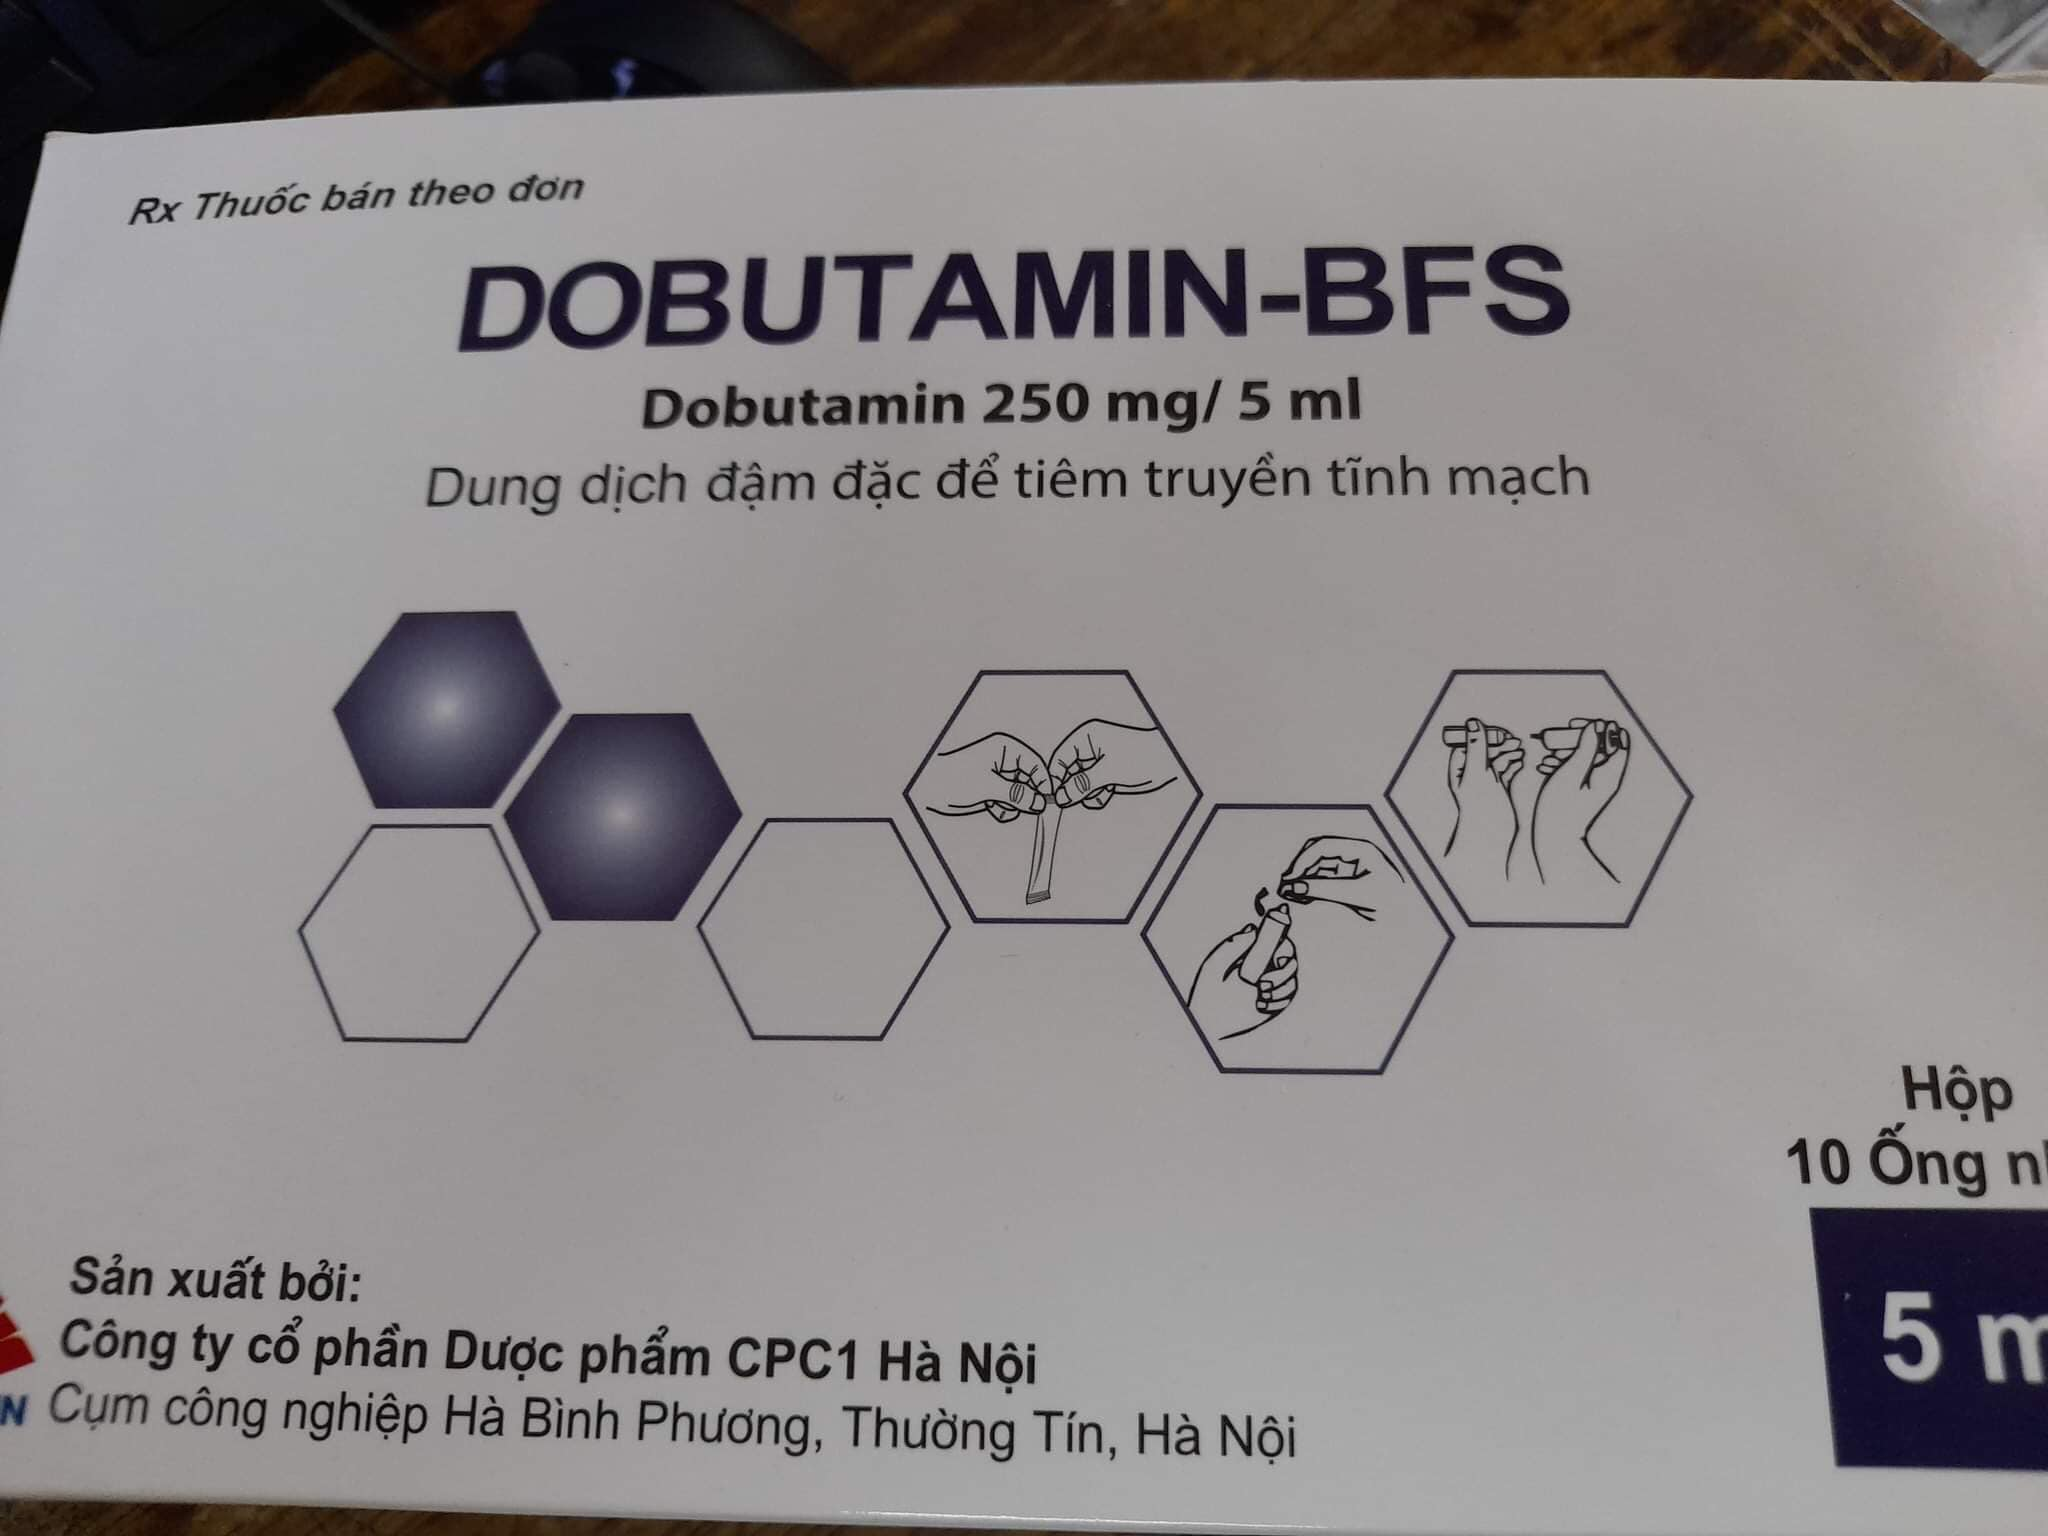 Dobutamin - BFS